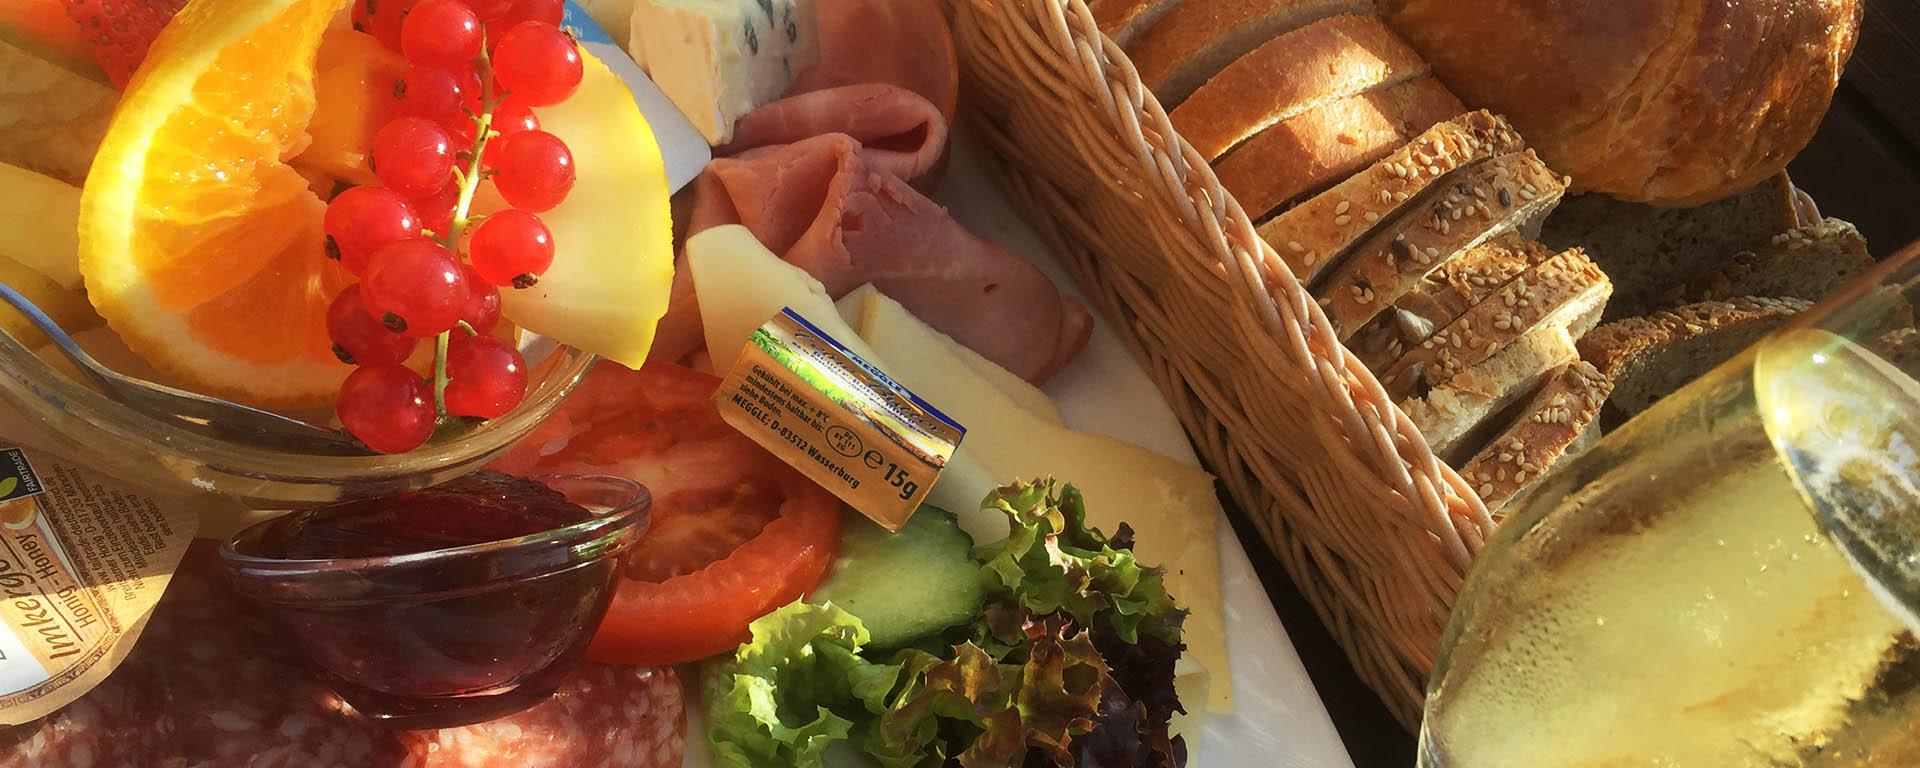 Frühstücken in Böblingen | Cafe Schilling